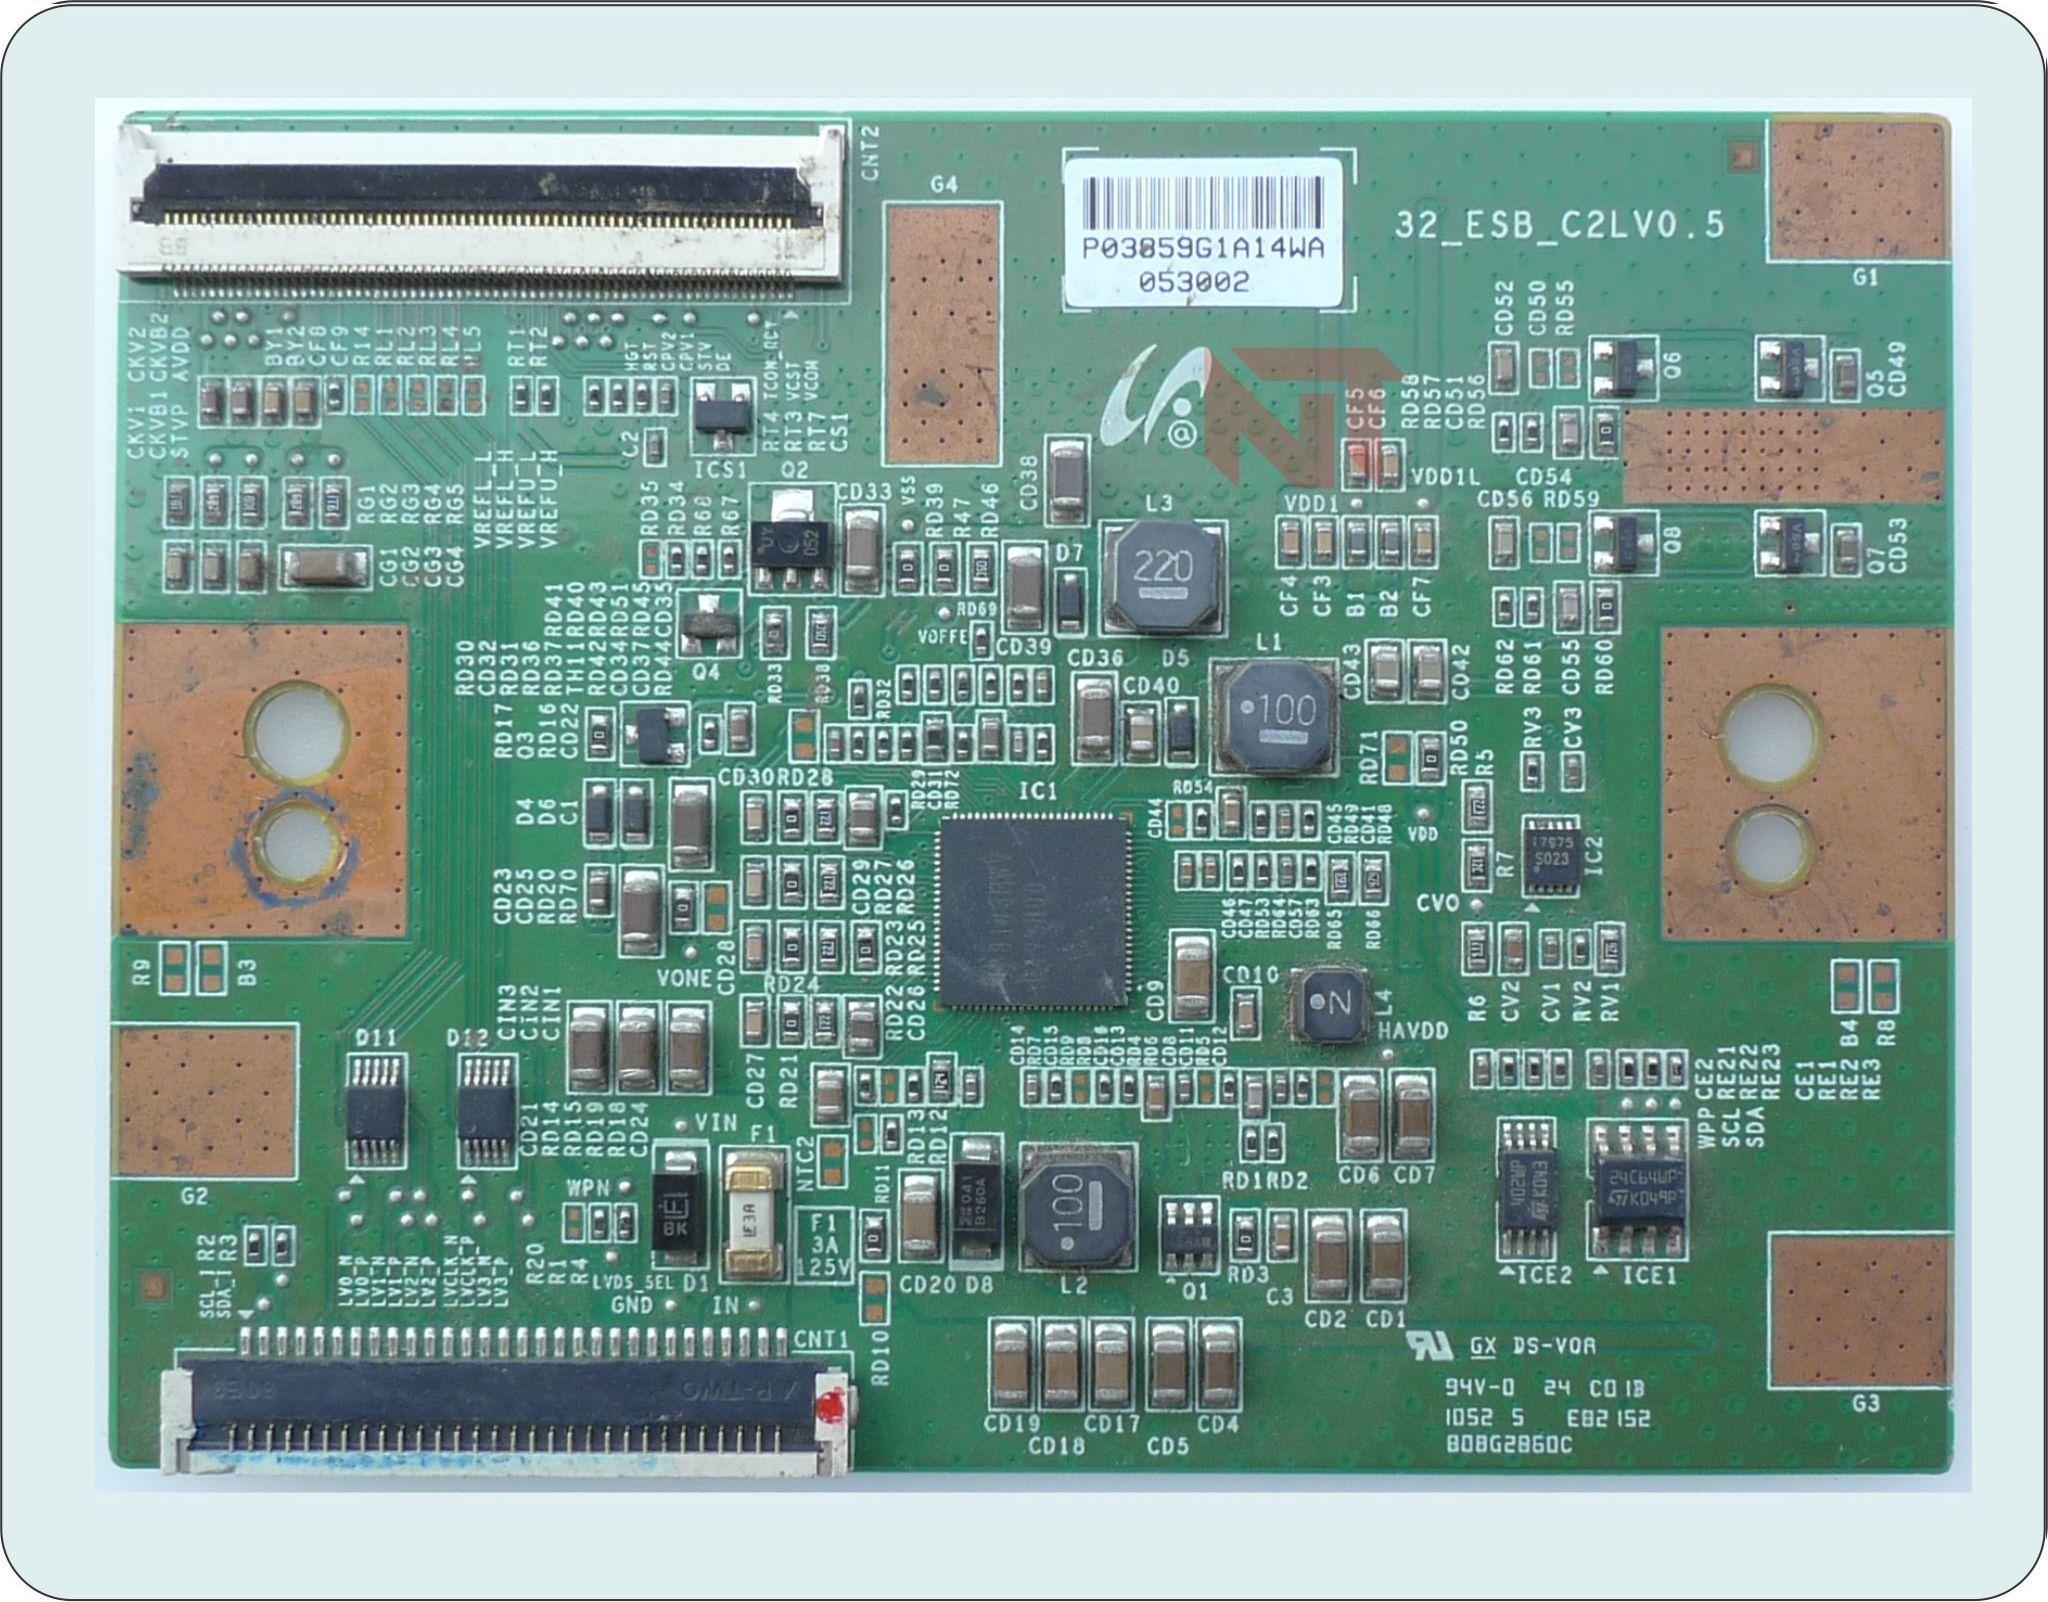 t con board block diagram wiring library LG 55Lv9500 T-Con Board 6_32_esb_c2lv0 5 32_esb_c2lv0 5 t con board